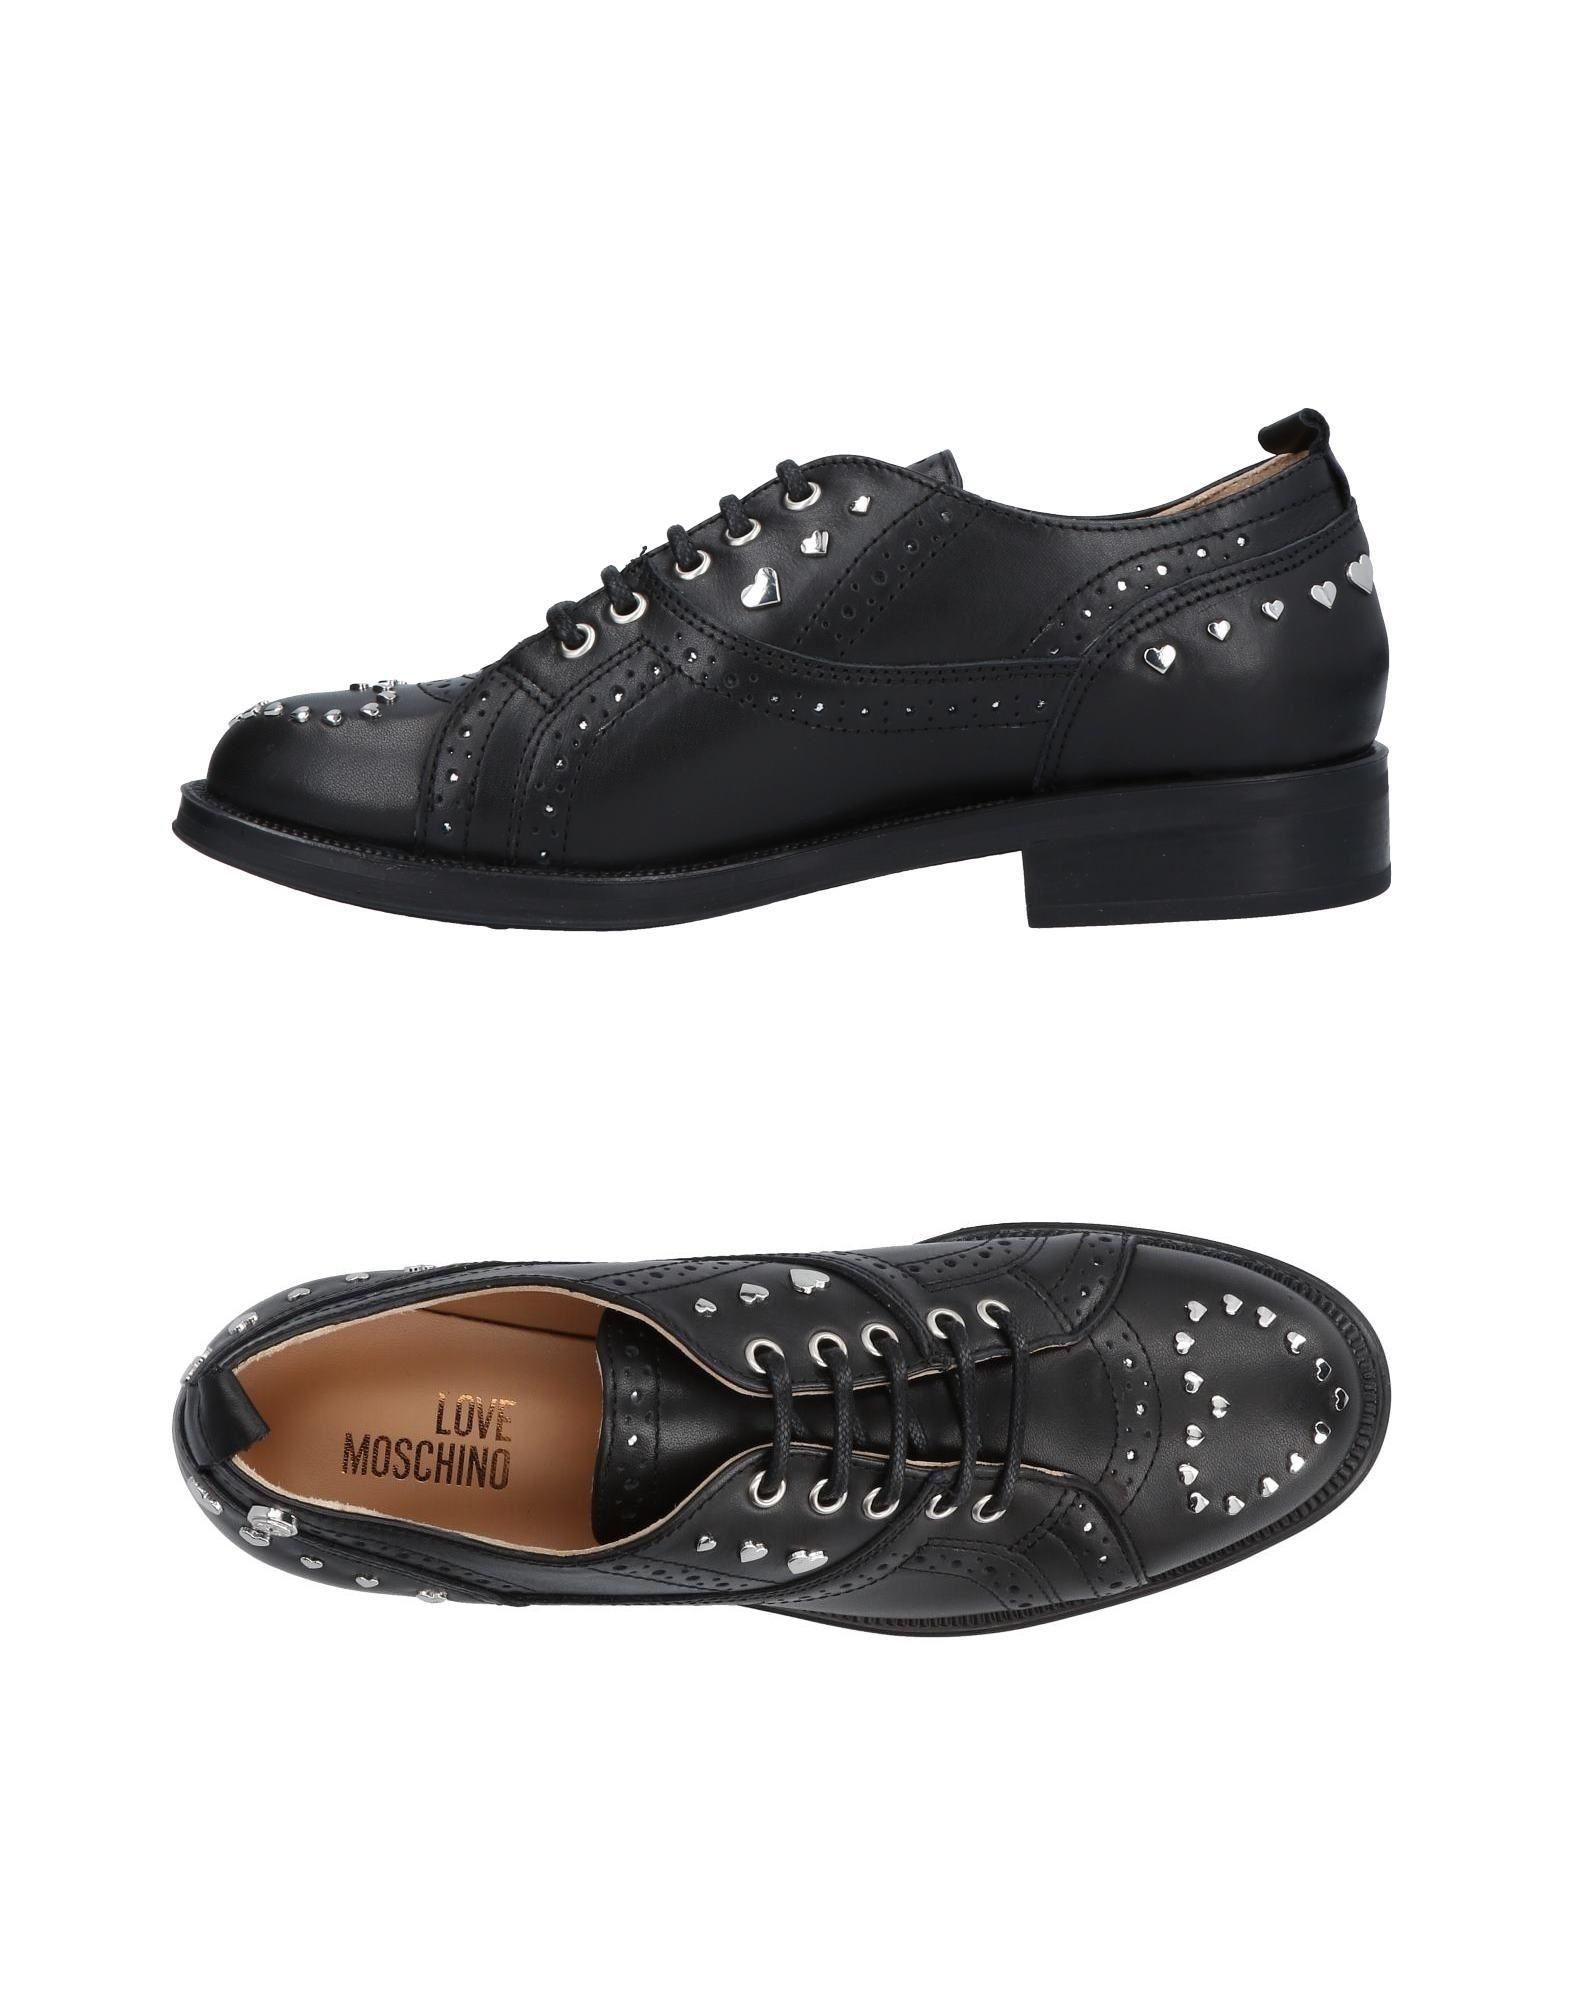 LOVE MOSCHINO Обувь на шнурках цены онлайн